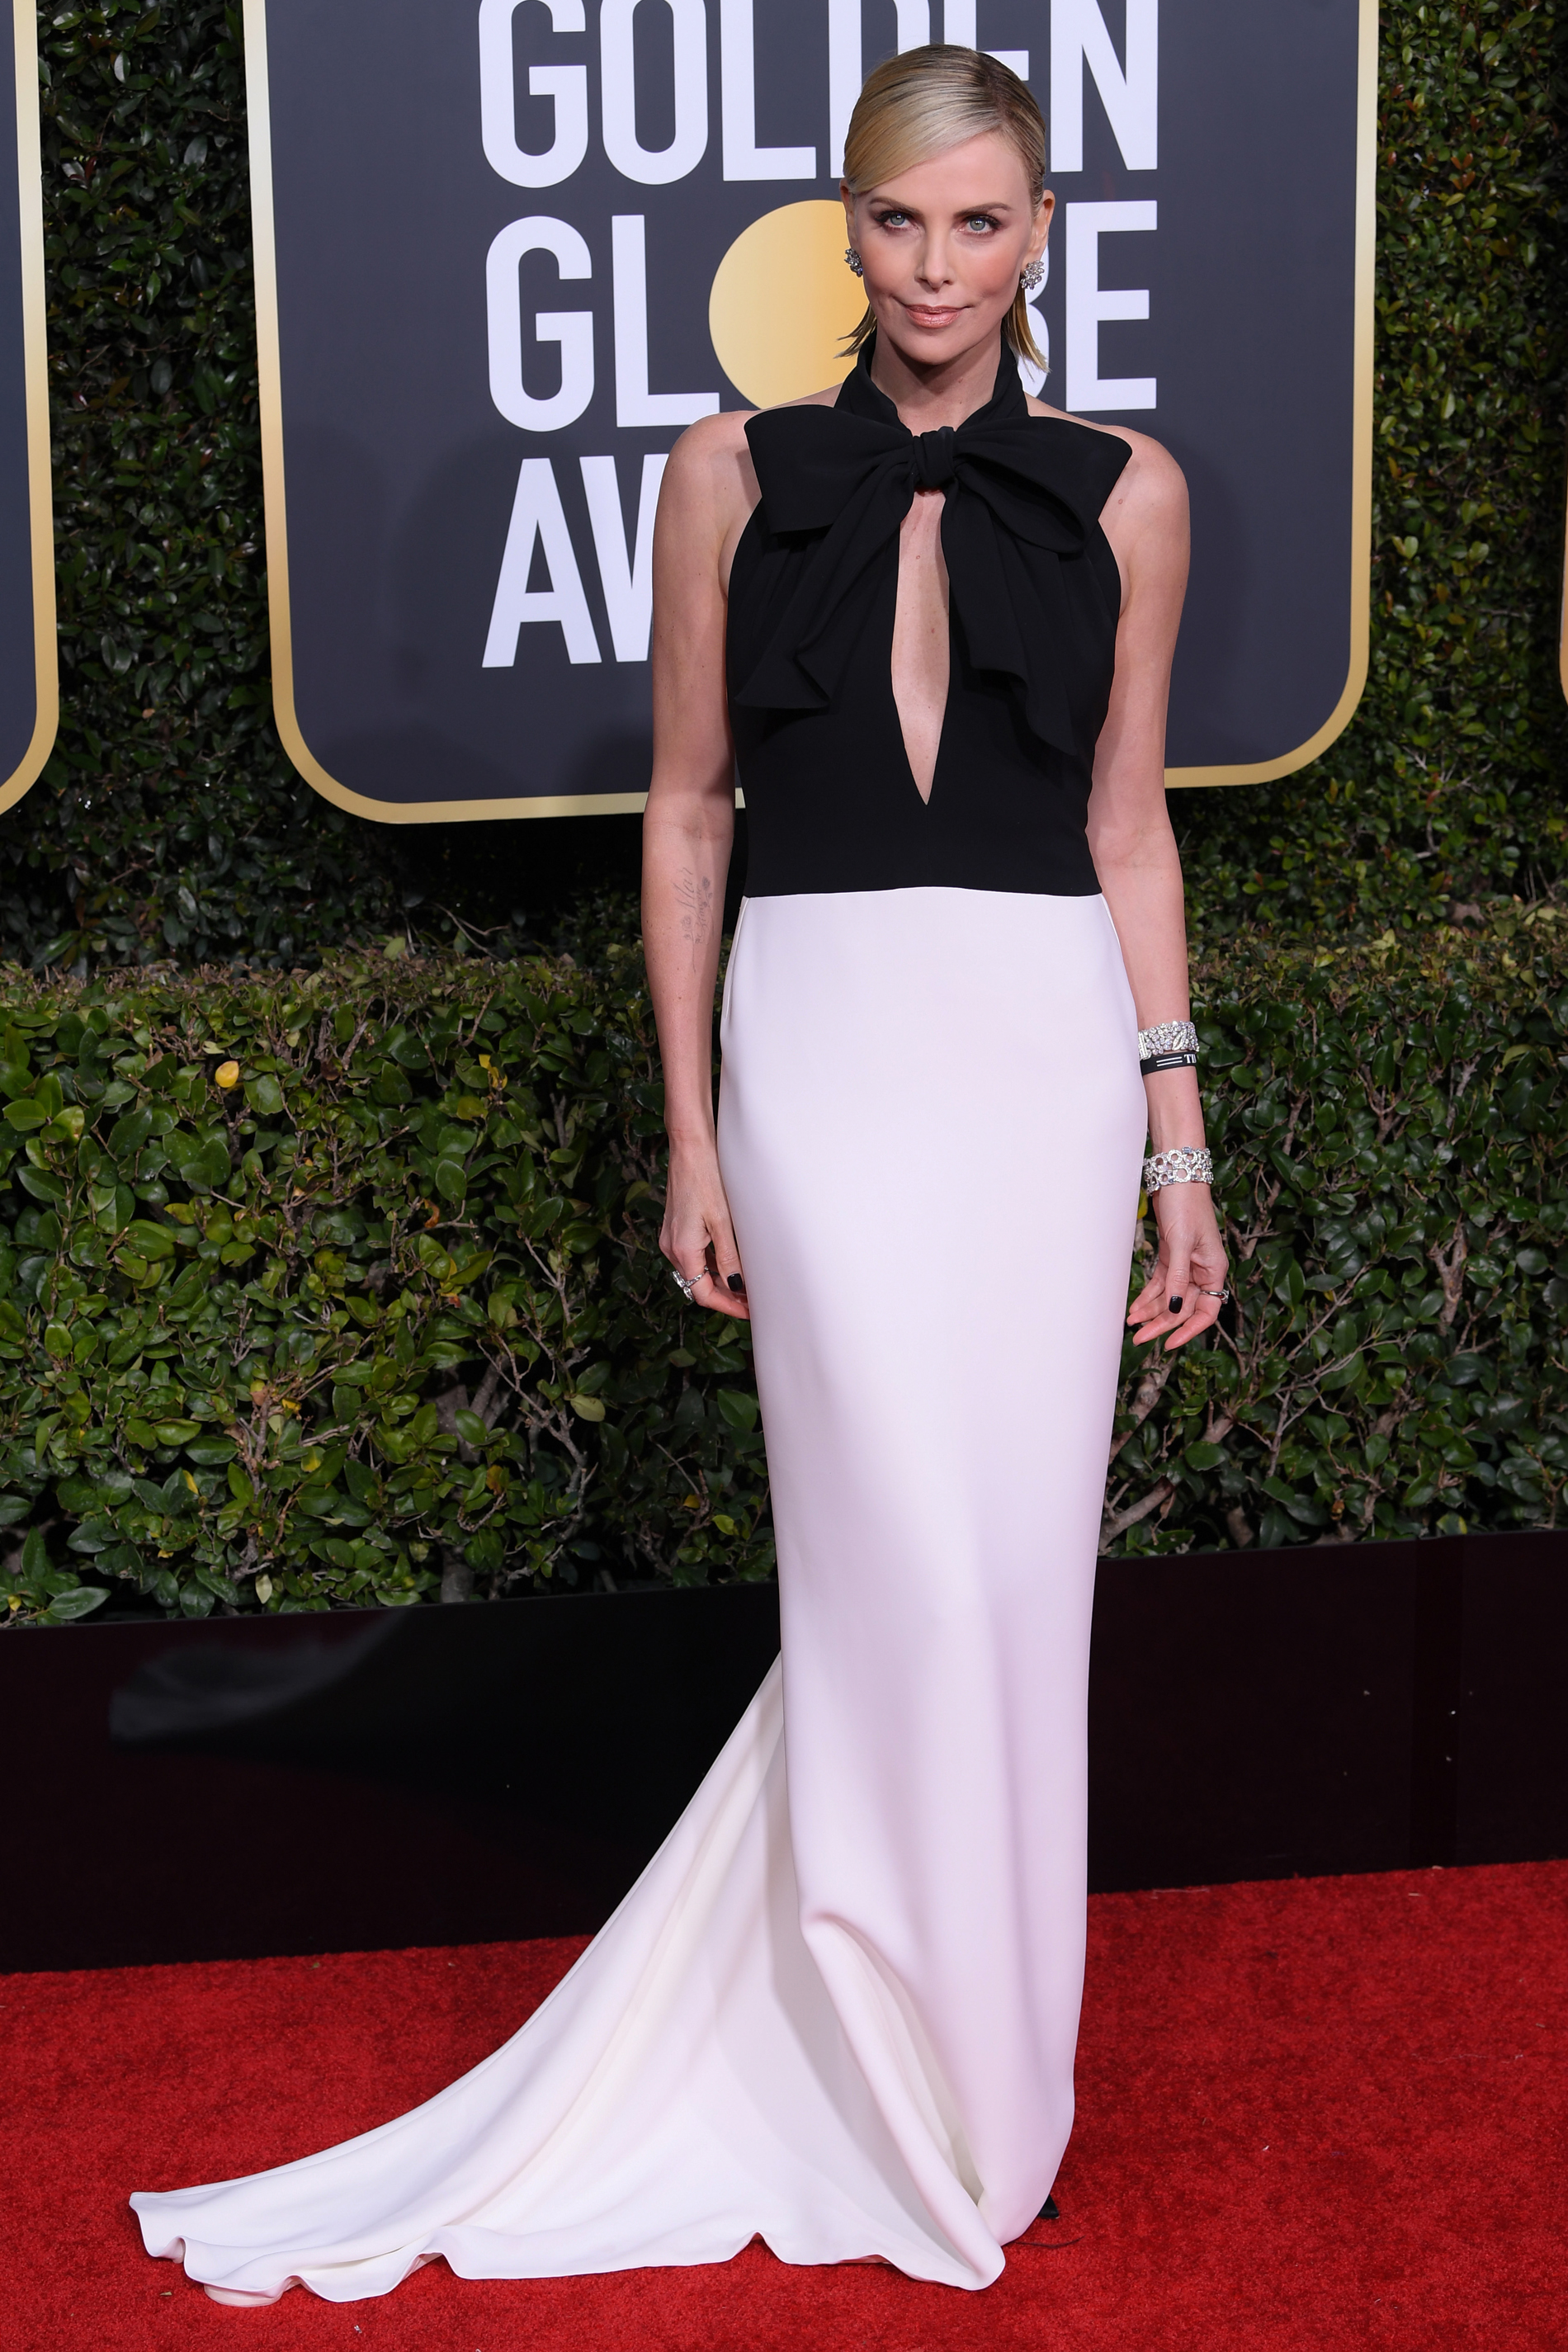 Charlize Theron en blanco y negro de Dior CREDITO: E! ENTERTAINMENT